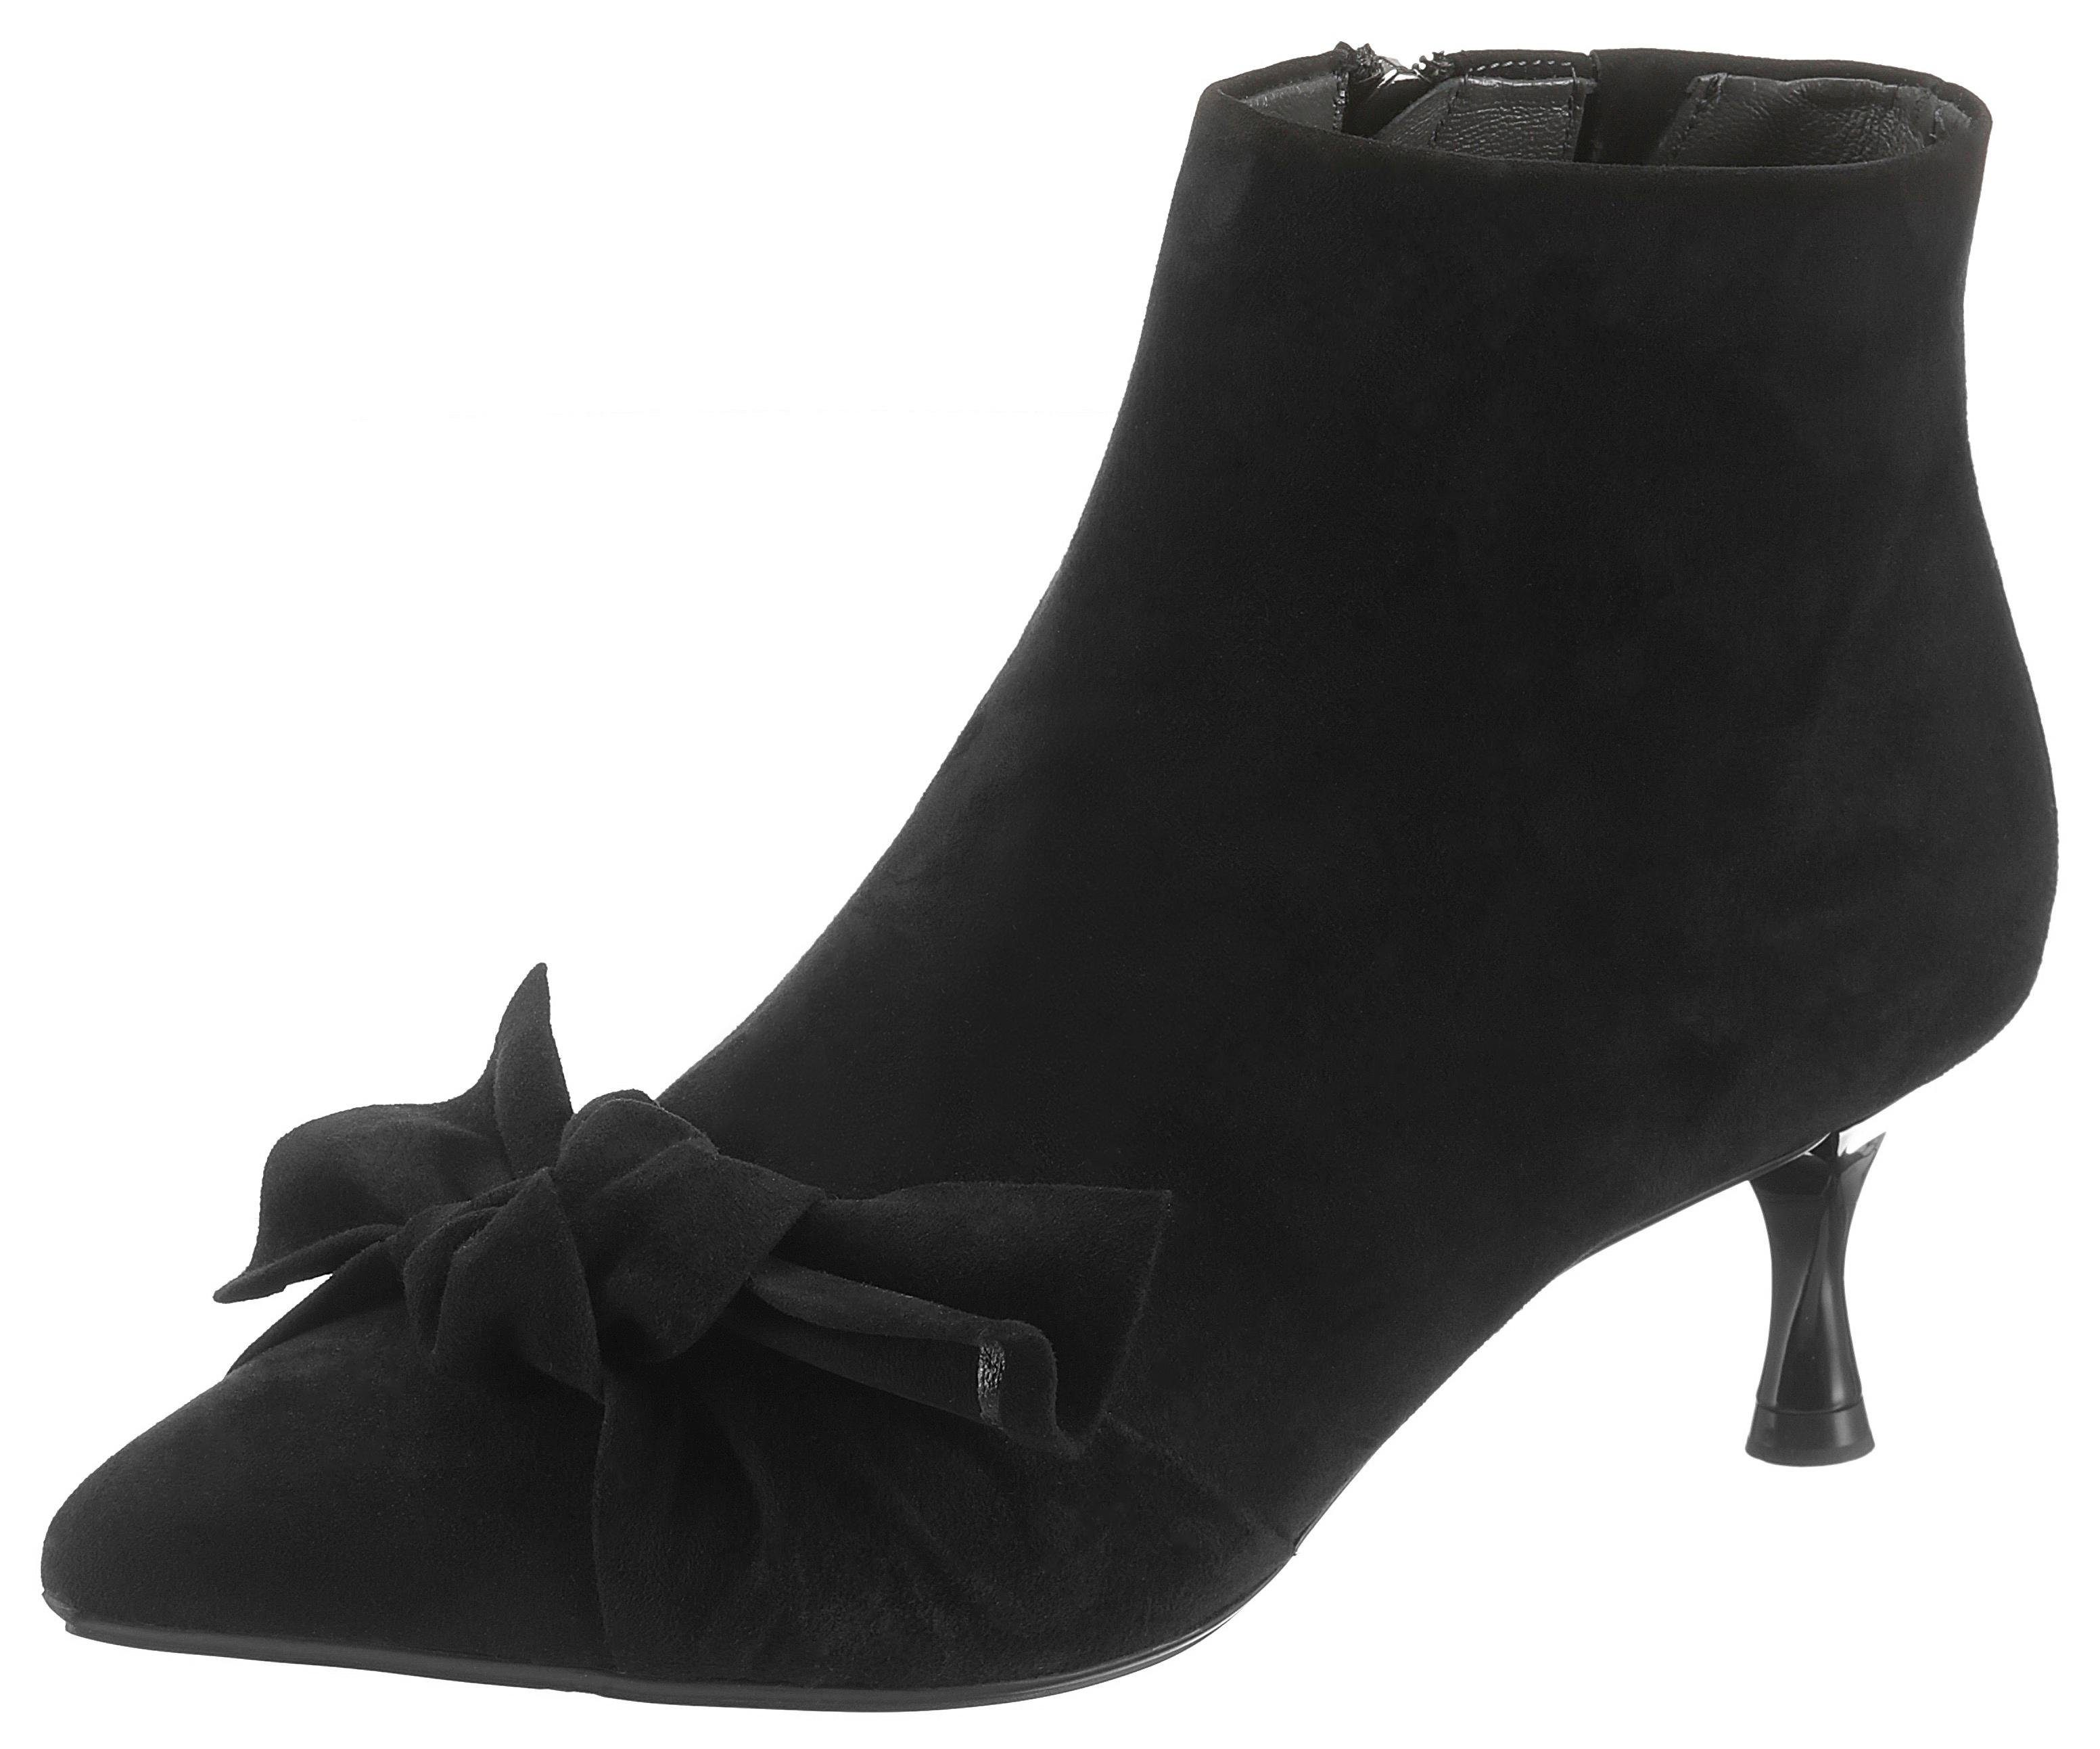 PETER KAISER Ankle Boot 'Qence' schwarz c0Xwv5